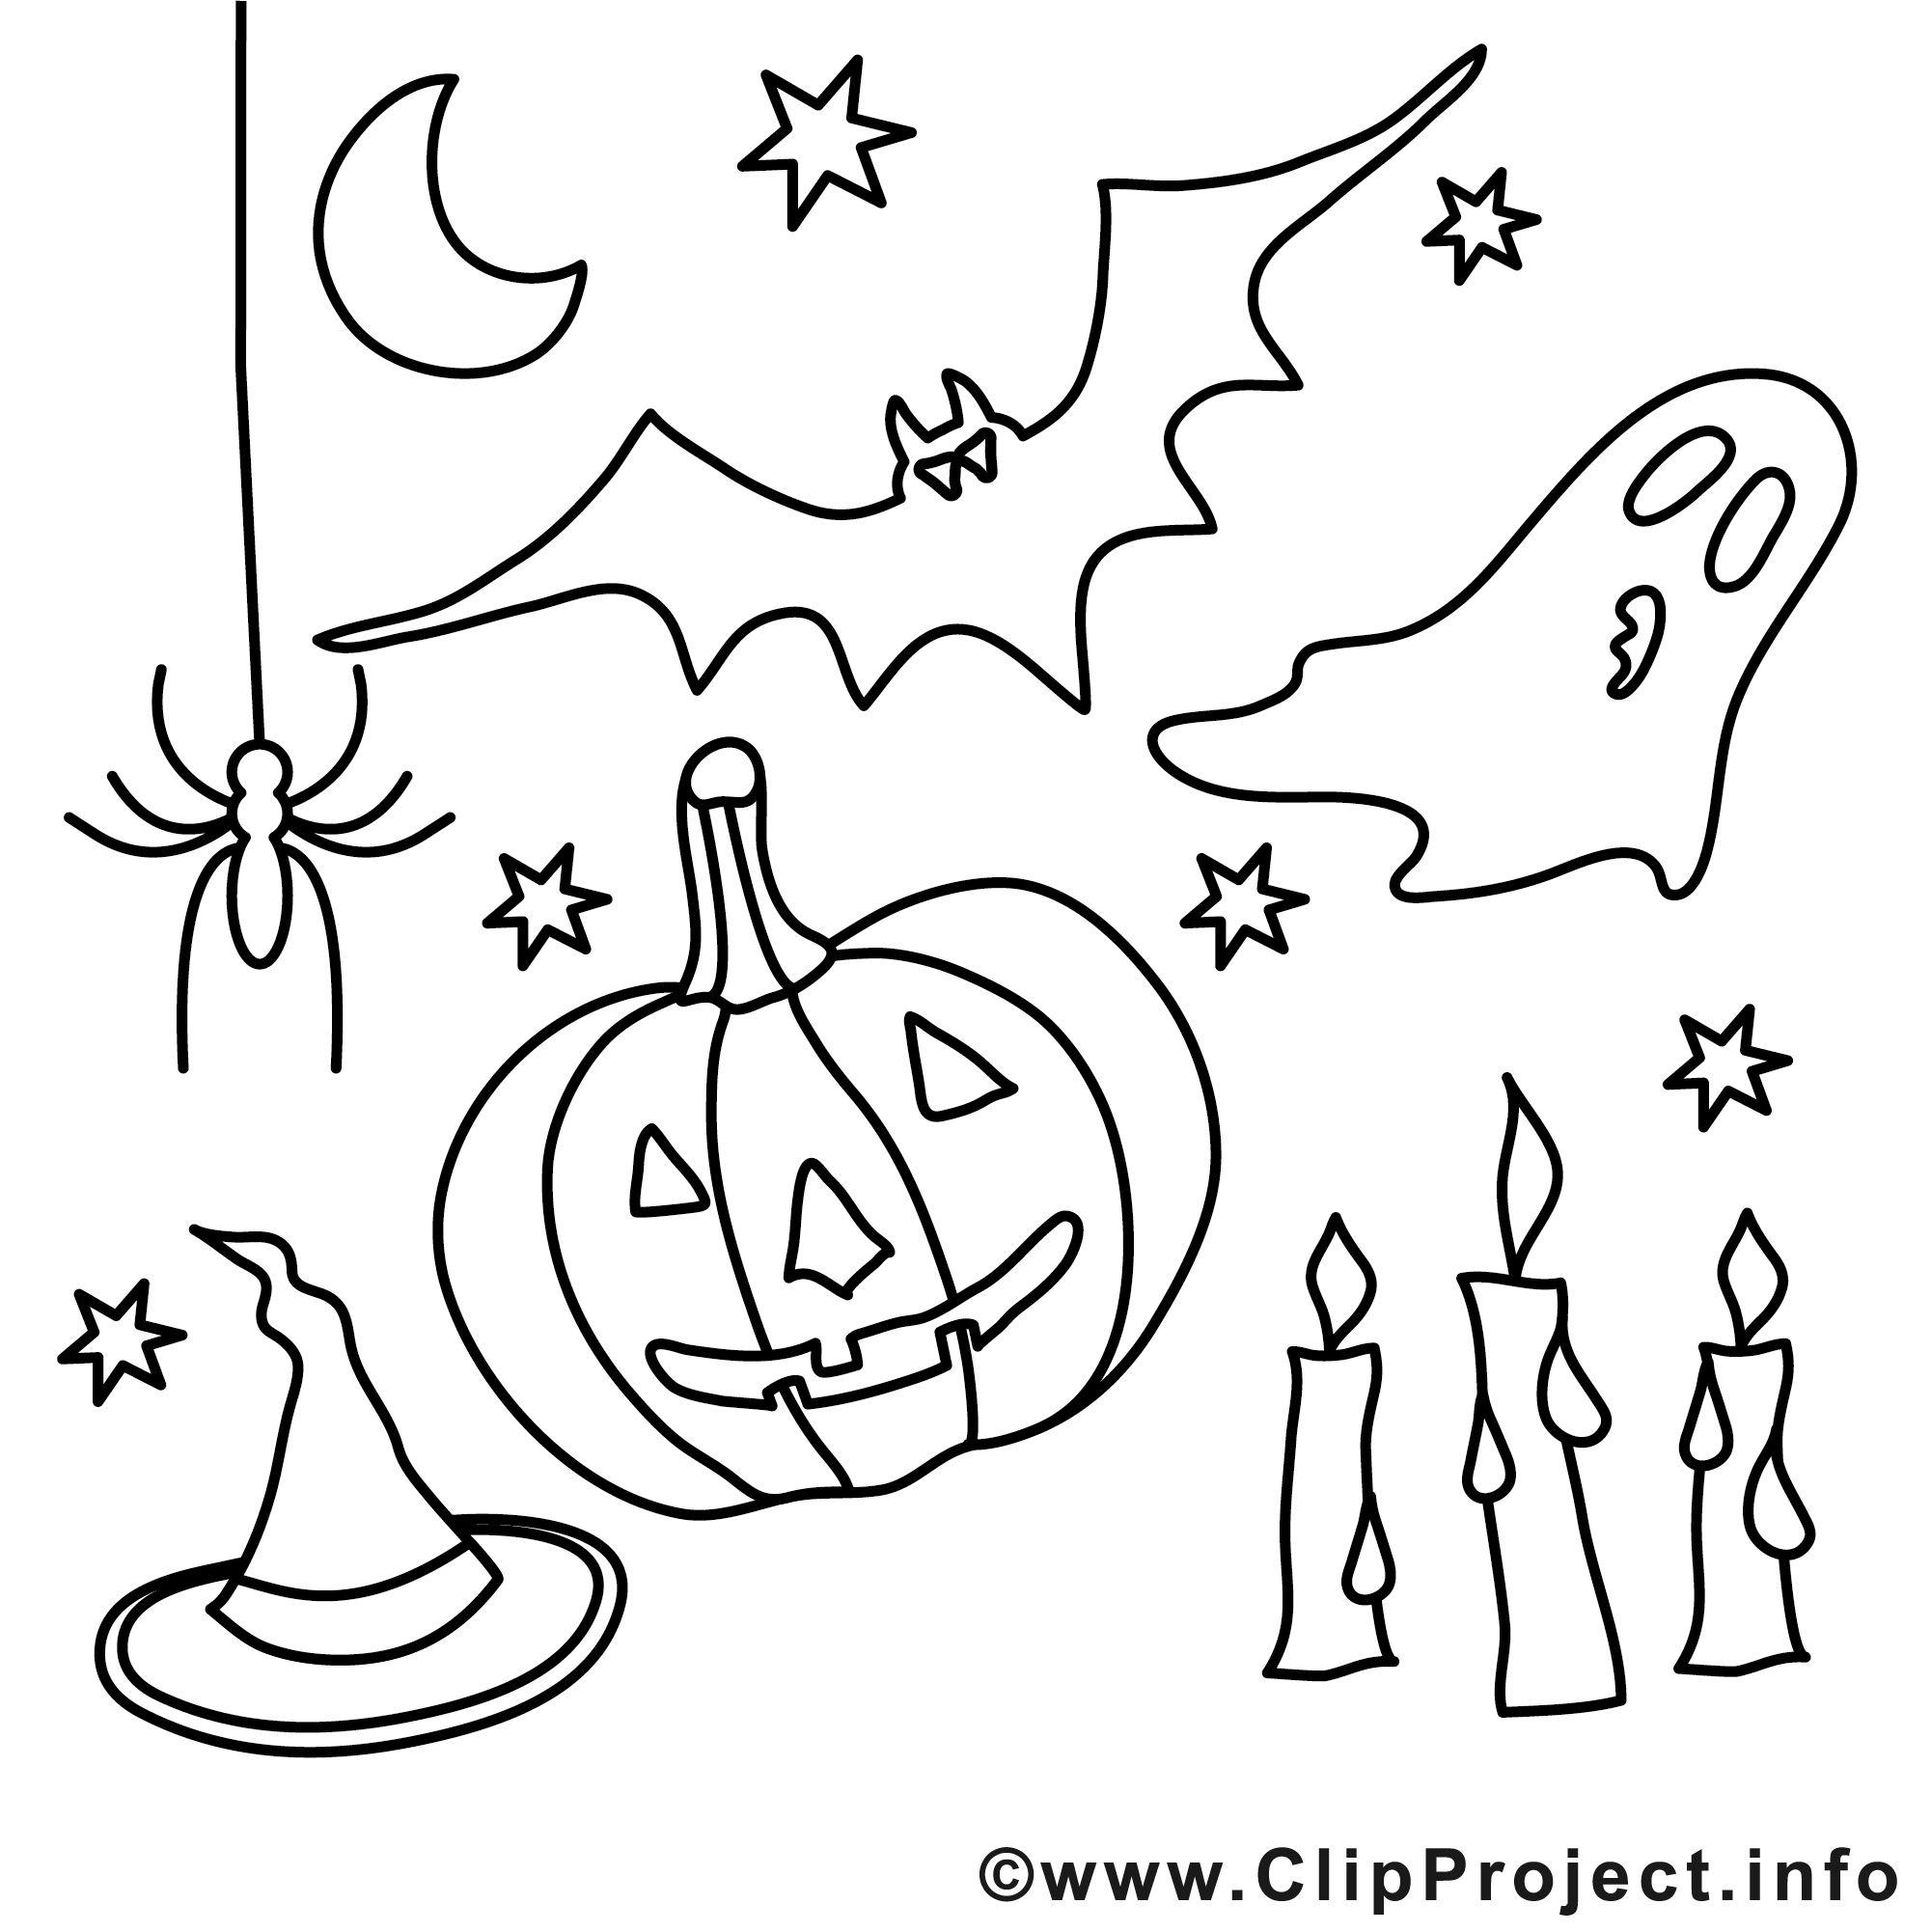 Ausmalbilder Gratis   Ausmalbilder, Ausmalbilder Gratis ganzes Ausmalbilder Zum Ausdrucken Halloween